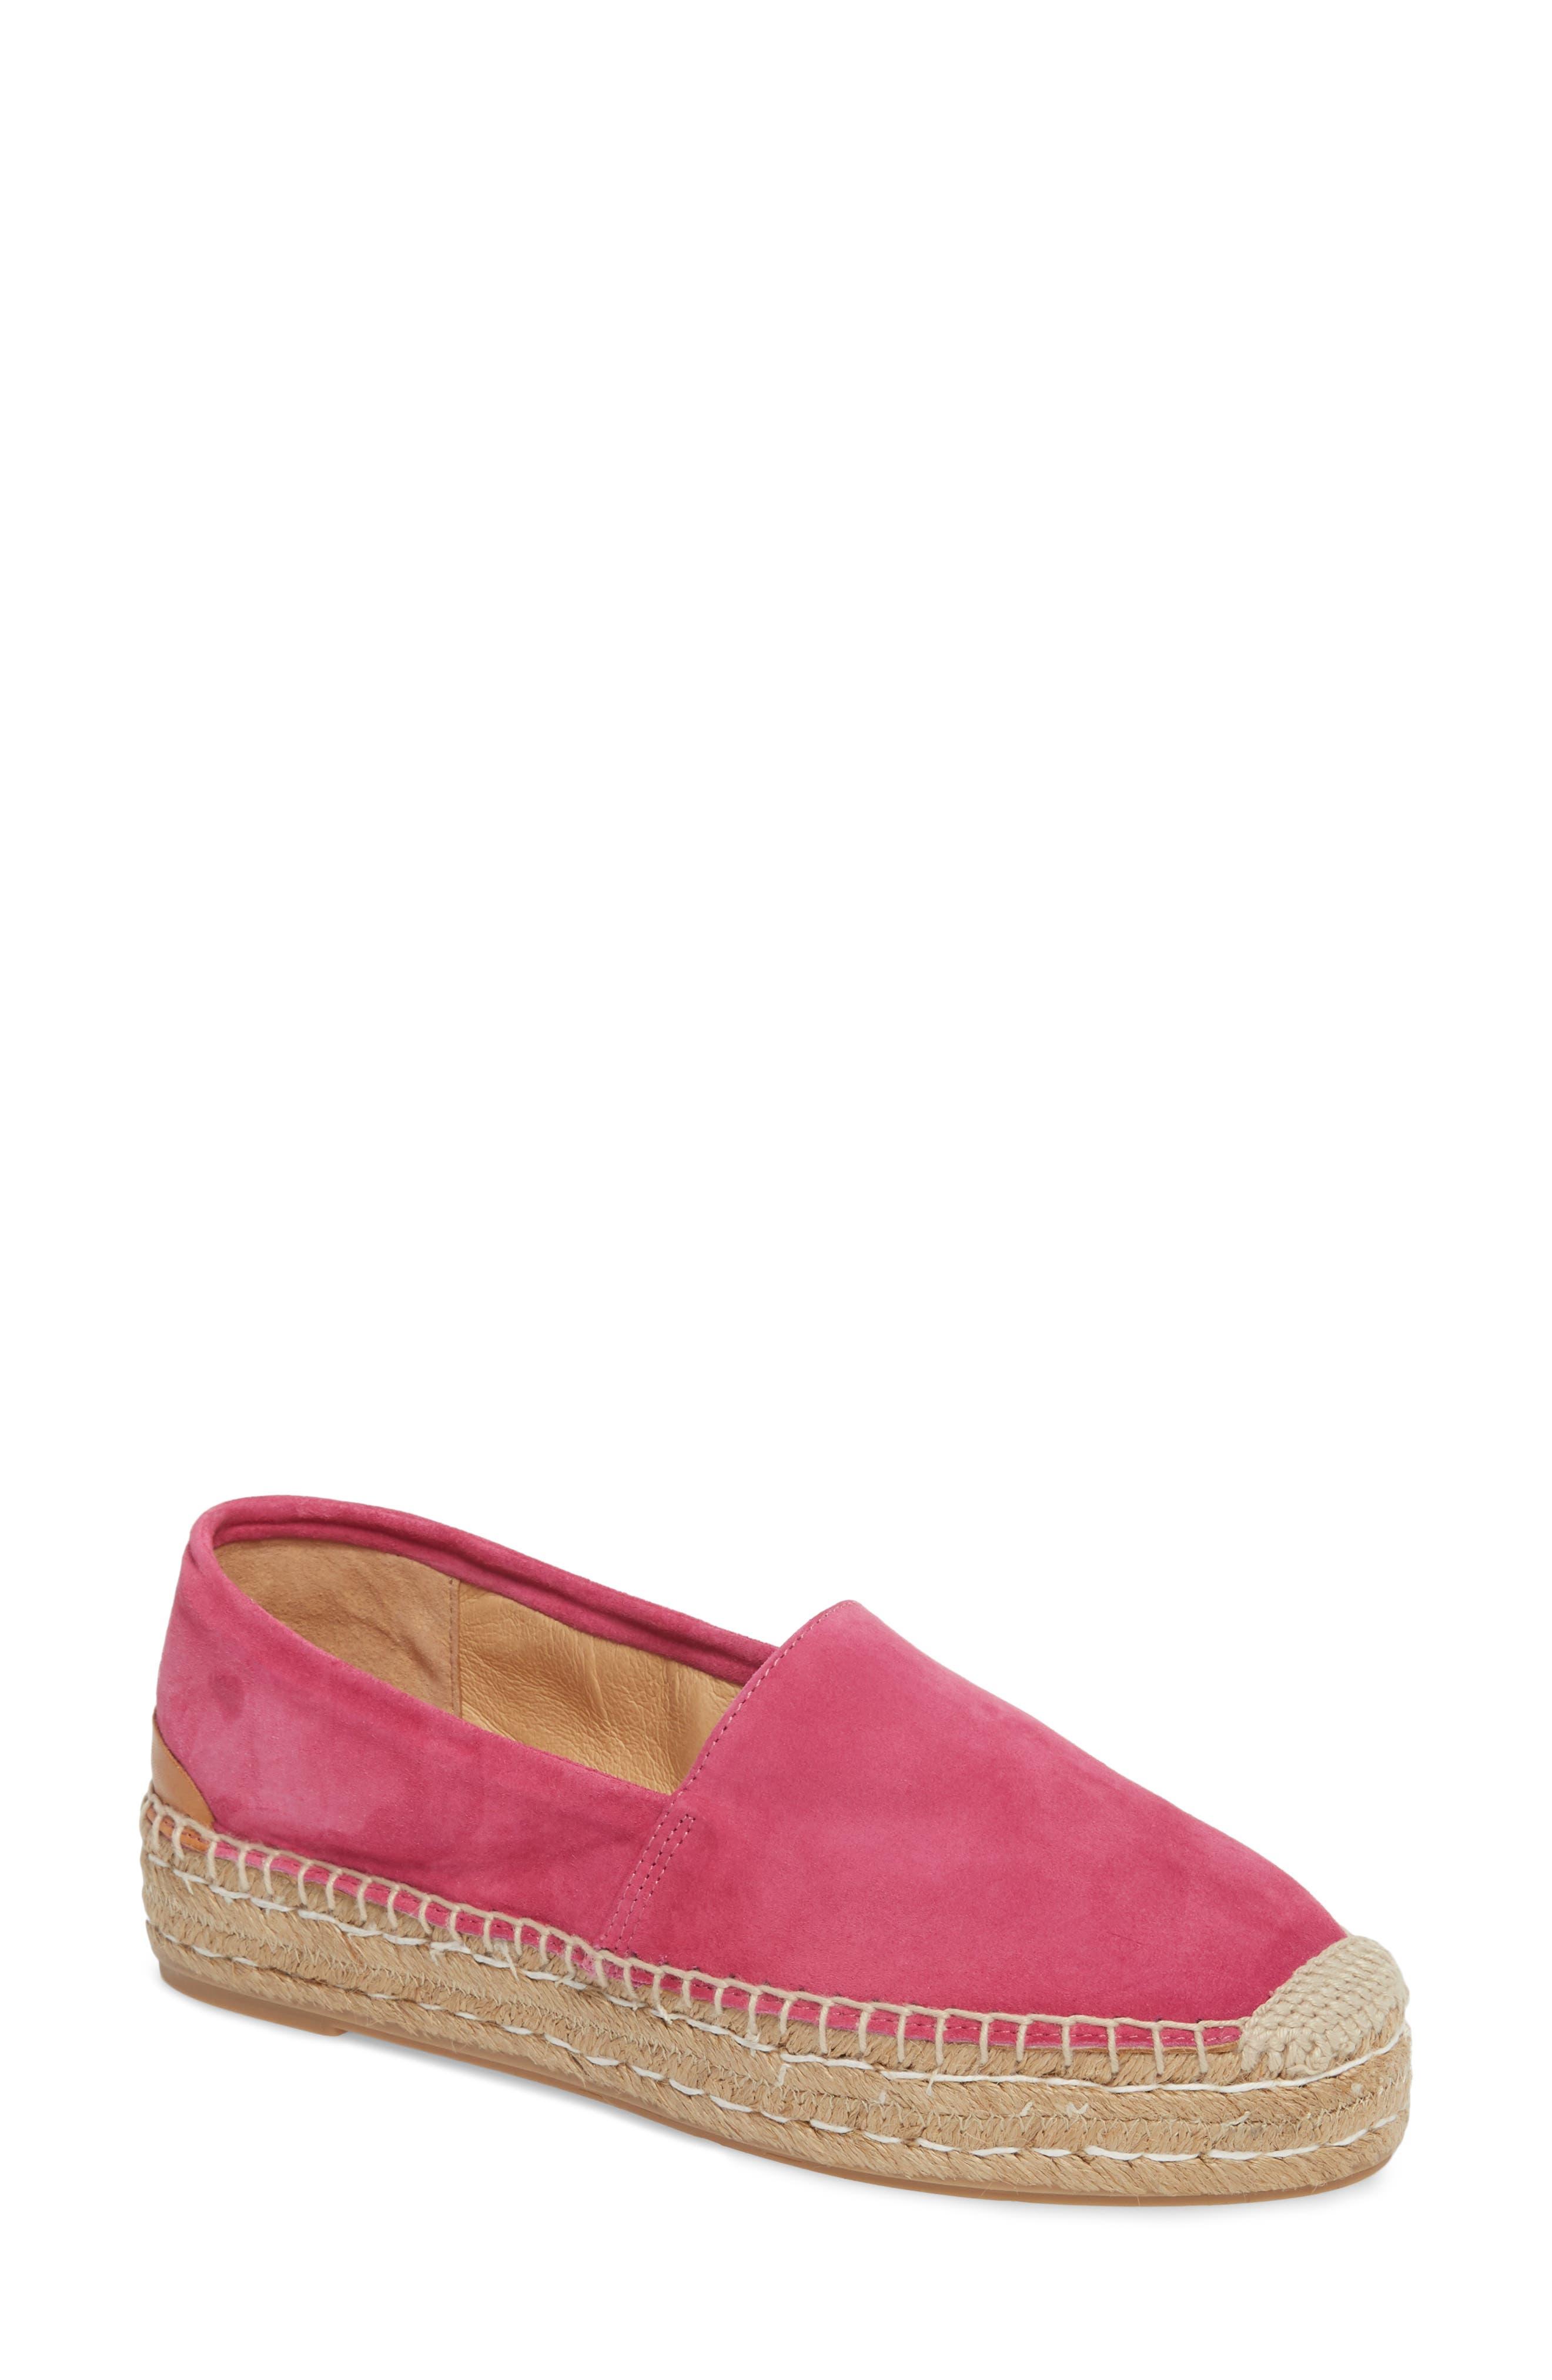 Abigail Espadrille Slip-On,                         Main,                         color, Hot Pink Suede